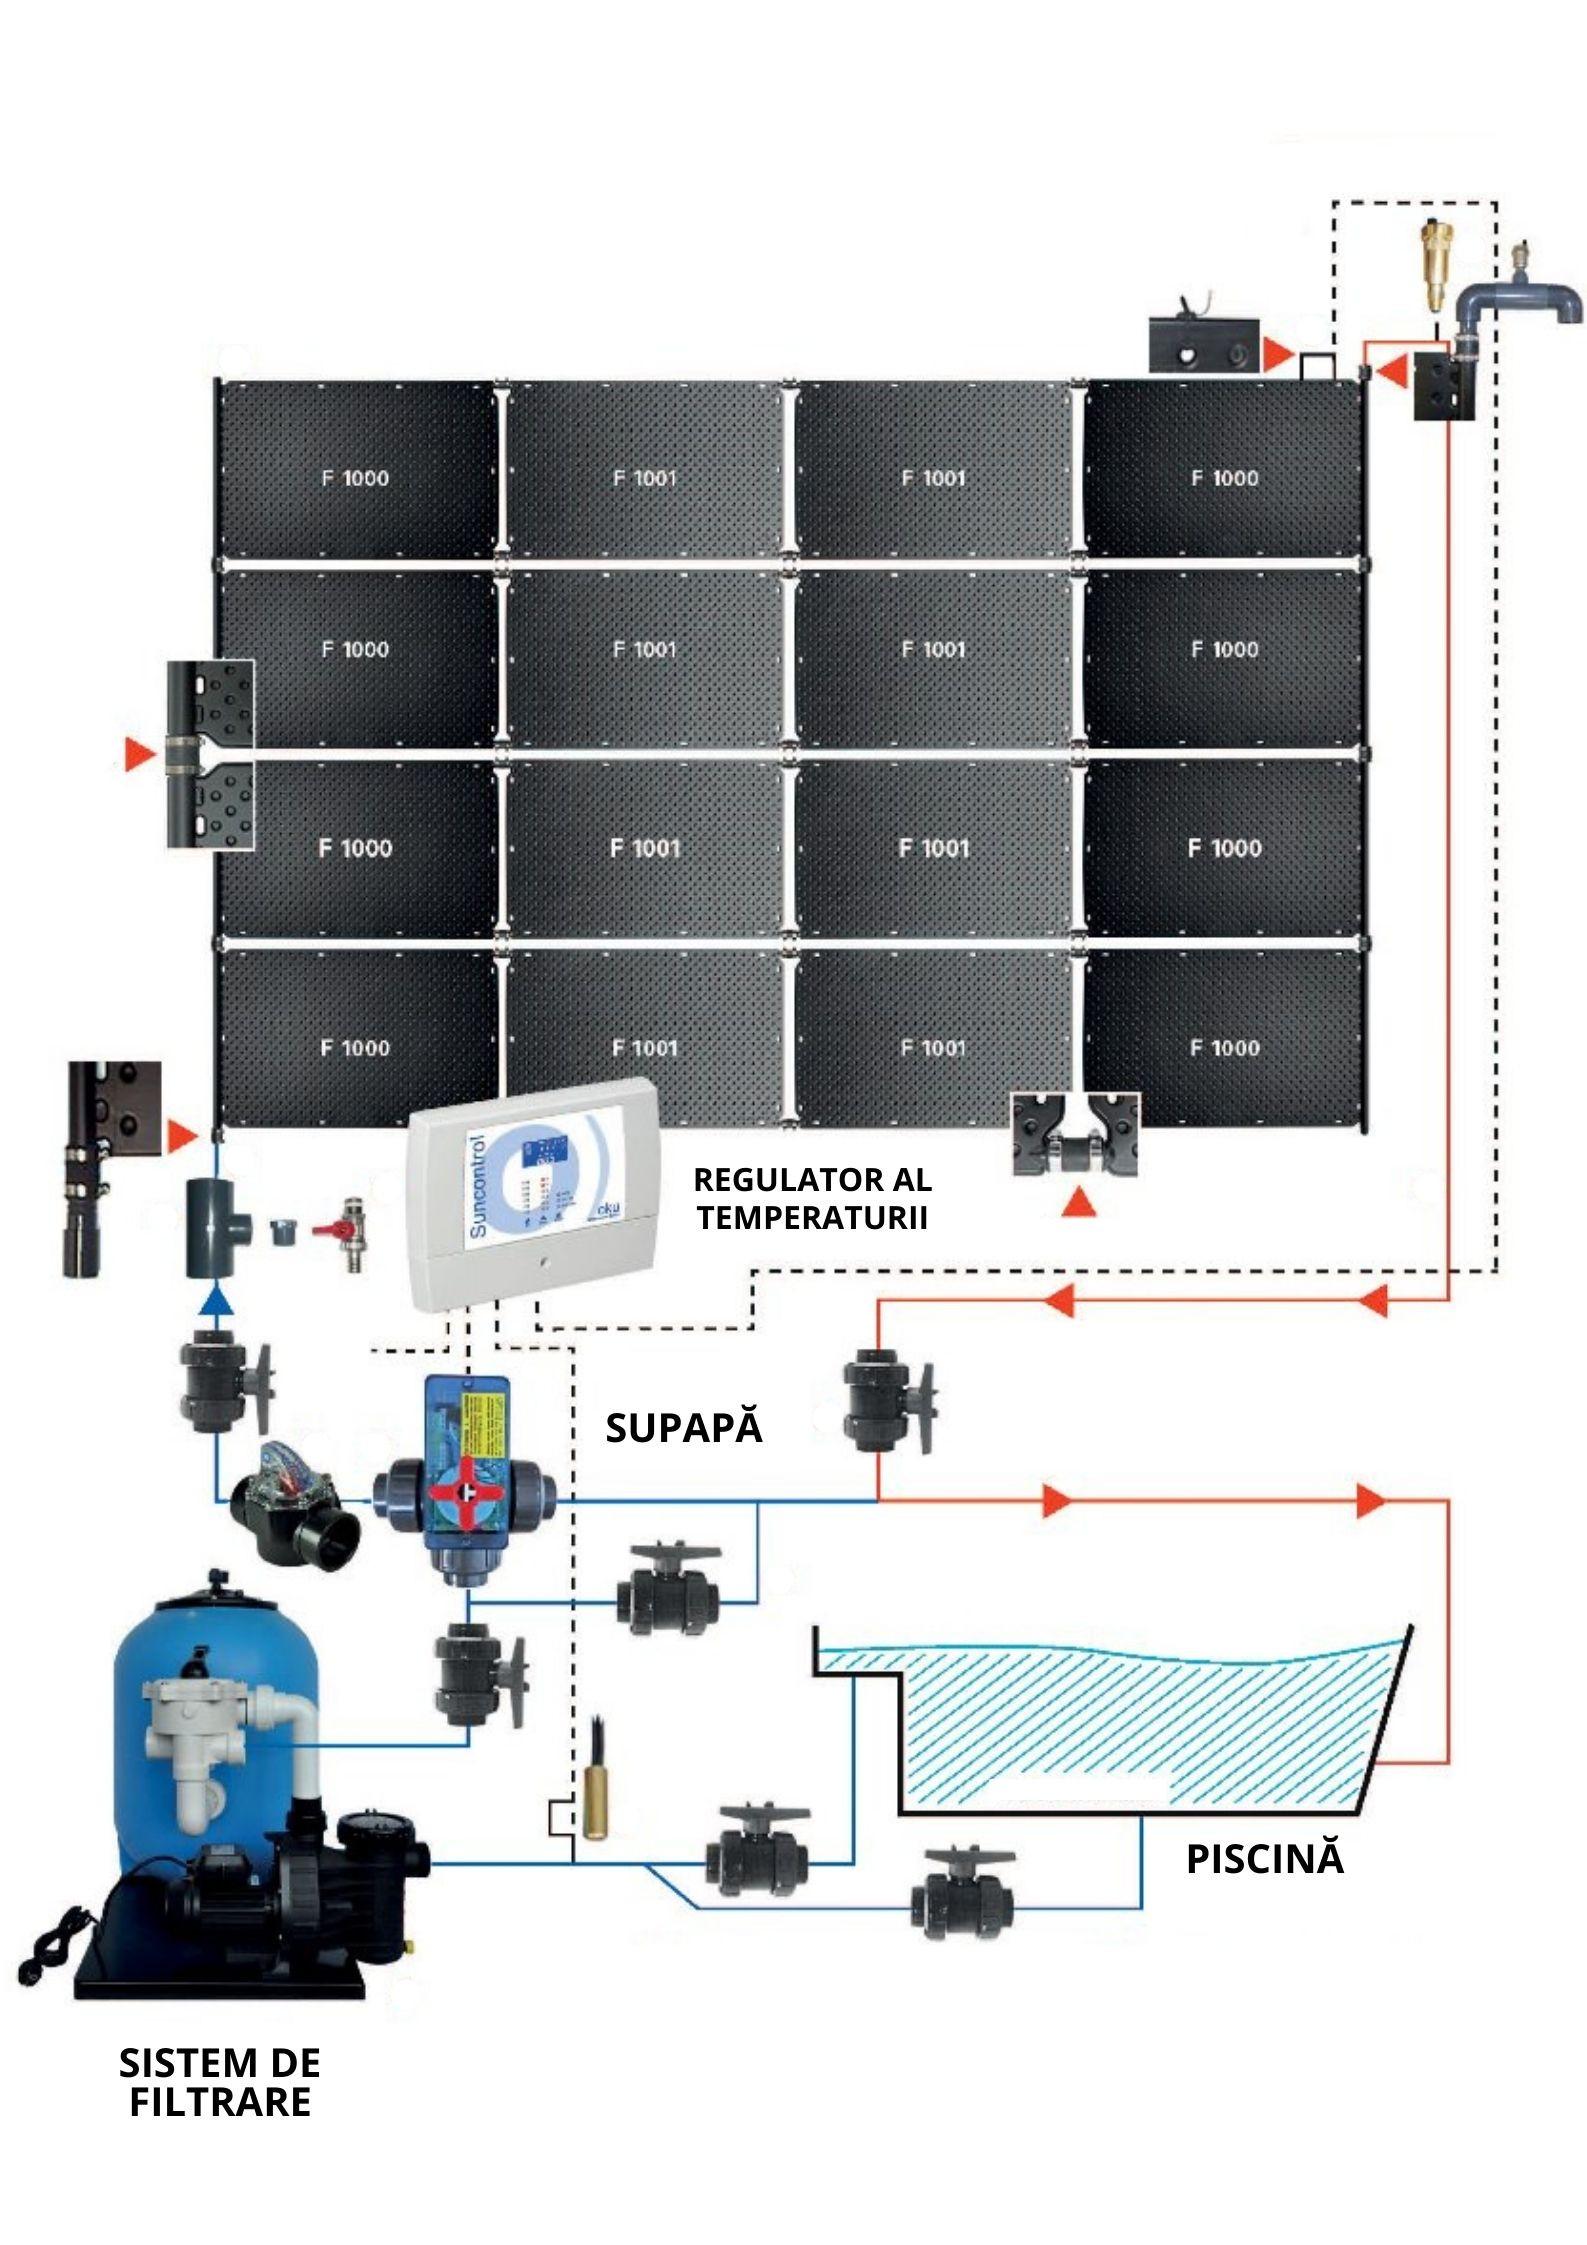 Schema de functionare a panourilor solare